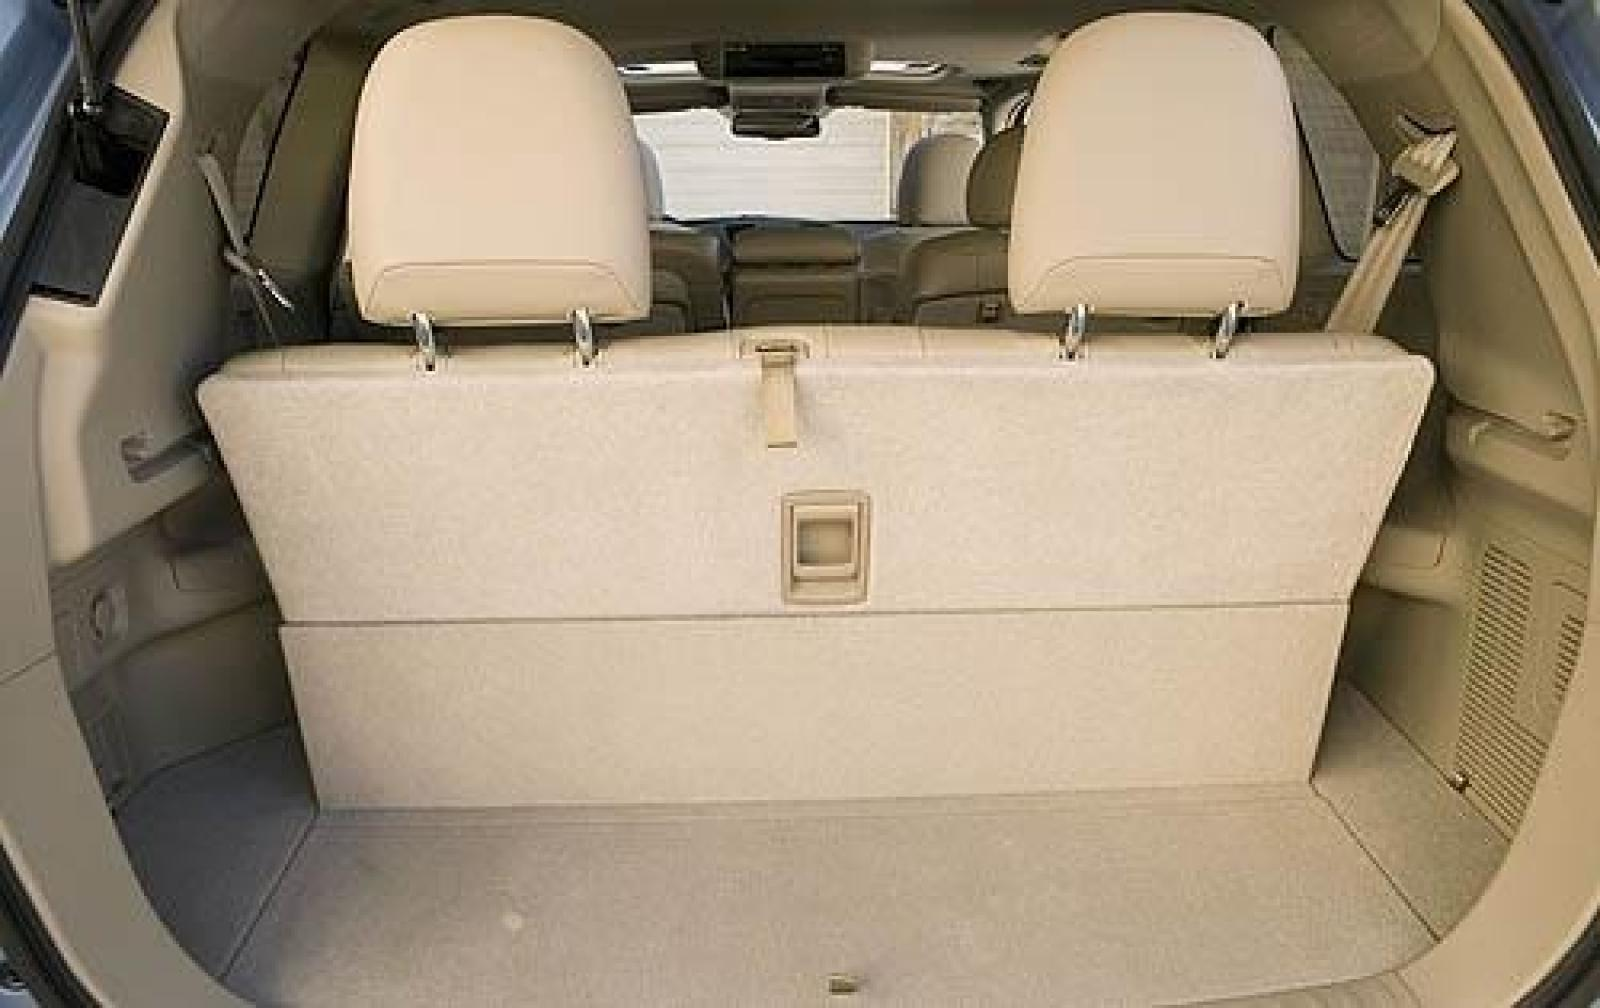 800 1024 1280 1600 Origin 2008 Toyota Highlander Hybrid